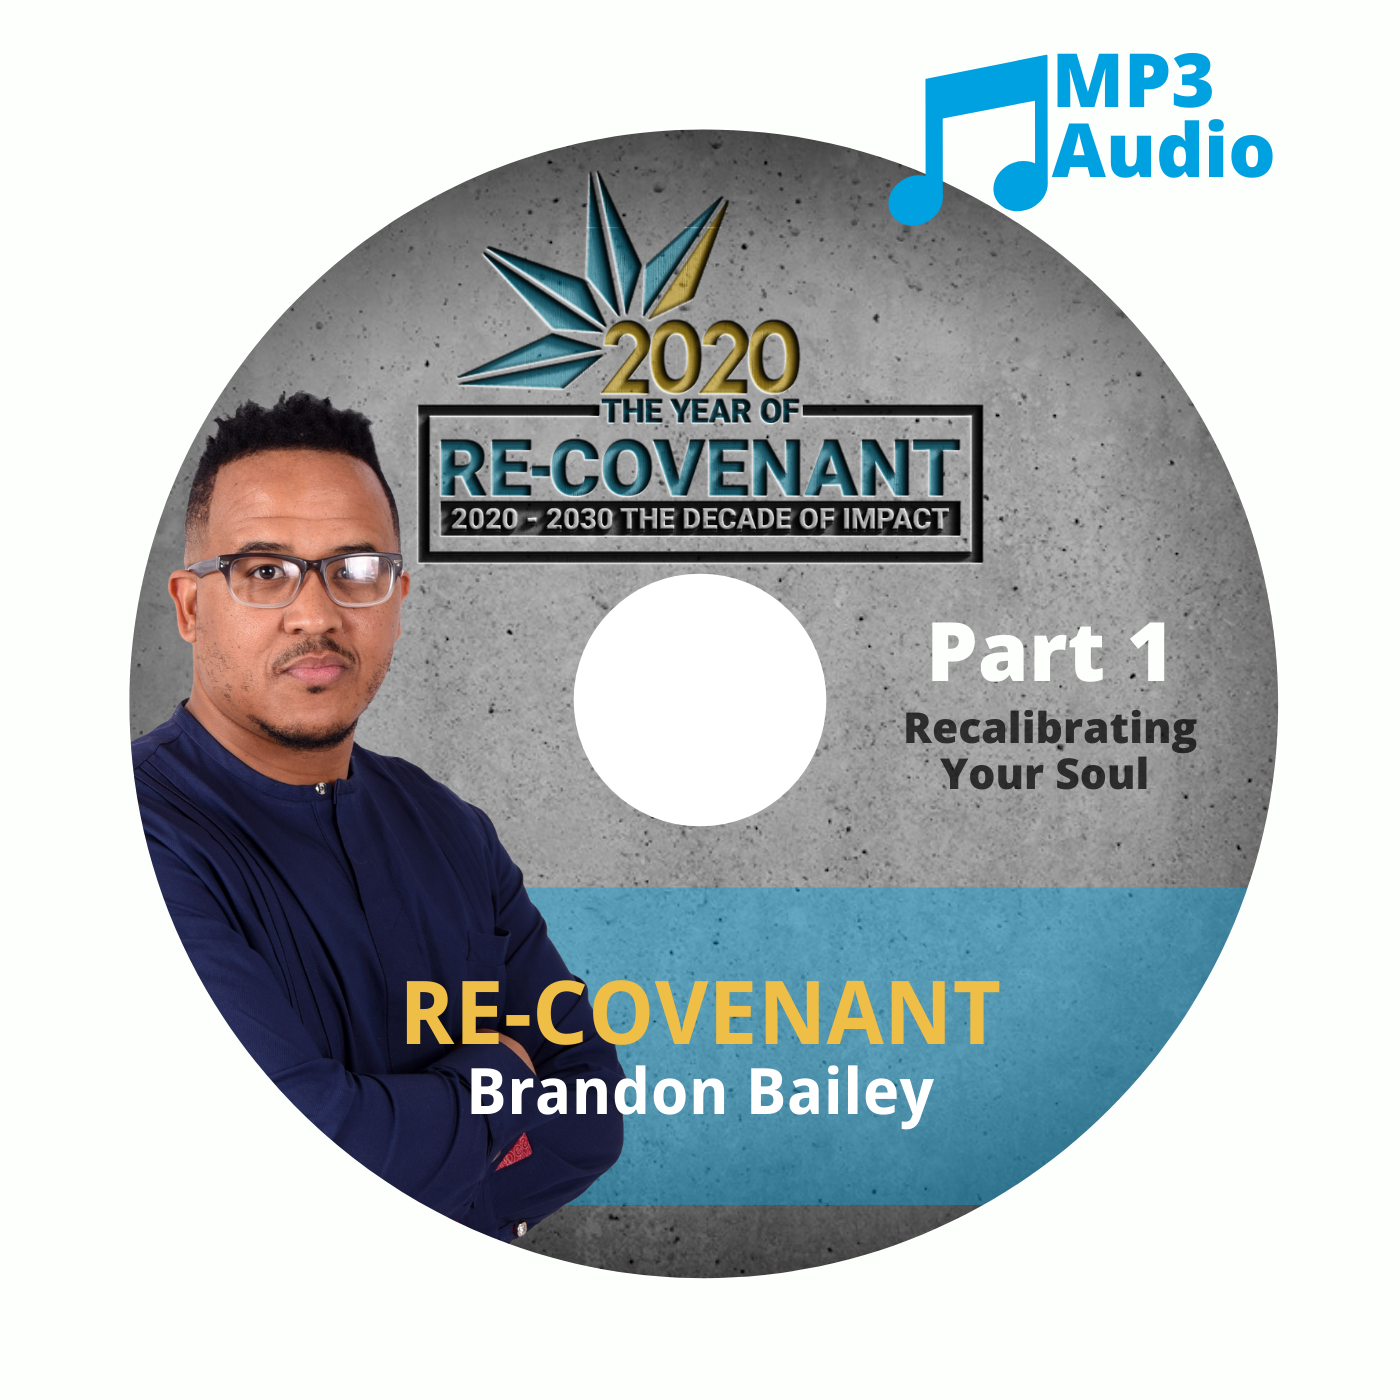 Re-Covenant Part 1: Recalibrating Your Soul